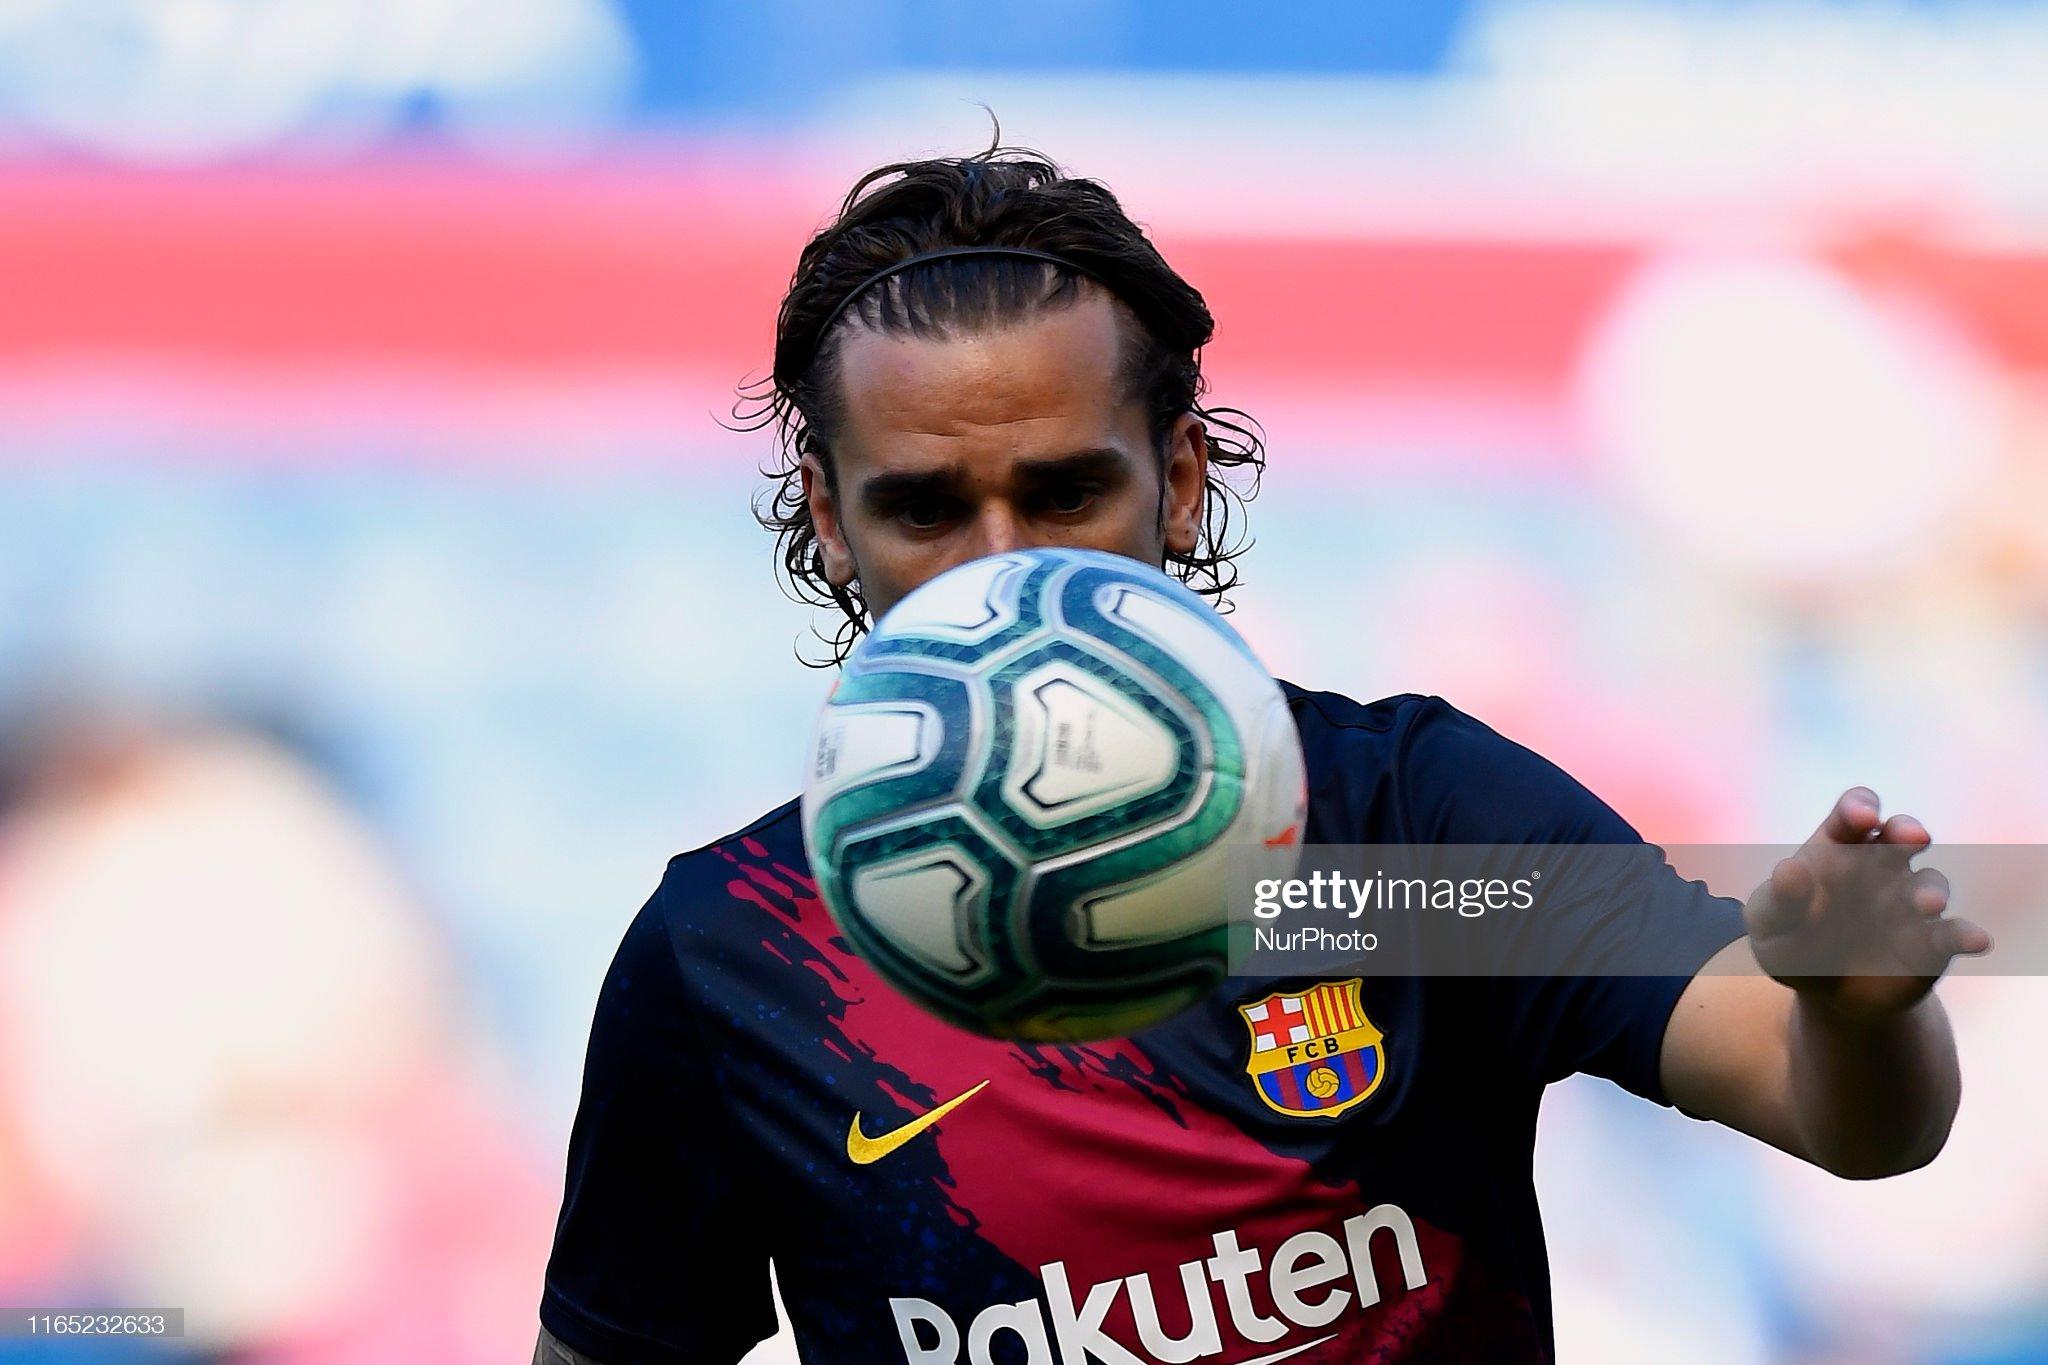 صور مباراة : أوساسونا - برشلونة 2-2 ( 31-08-2019 )  Antoine-griezmann-of-barcelona-during-the-warmup-before-the-liga-ca-picture-id1165232633?s=2048x2048